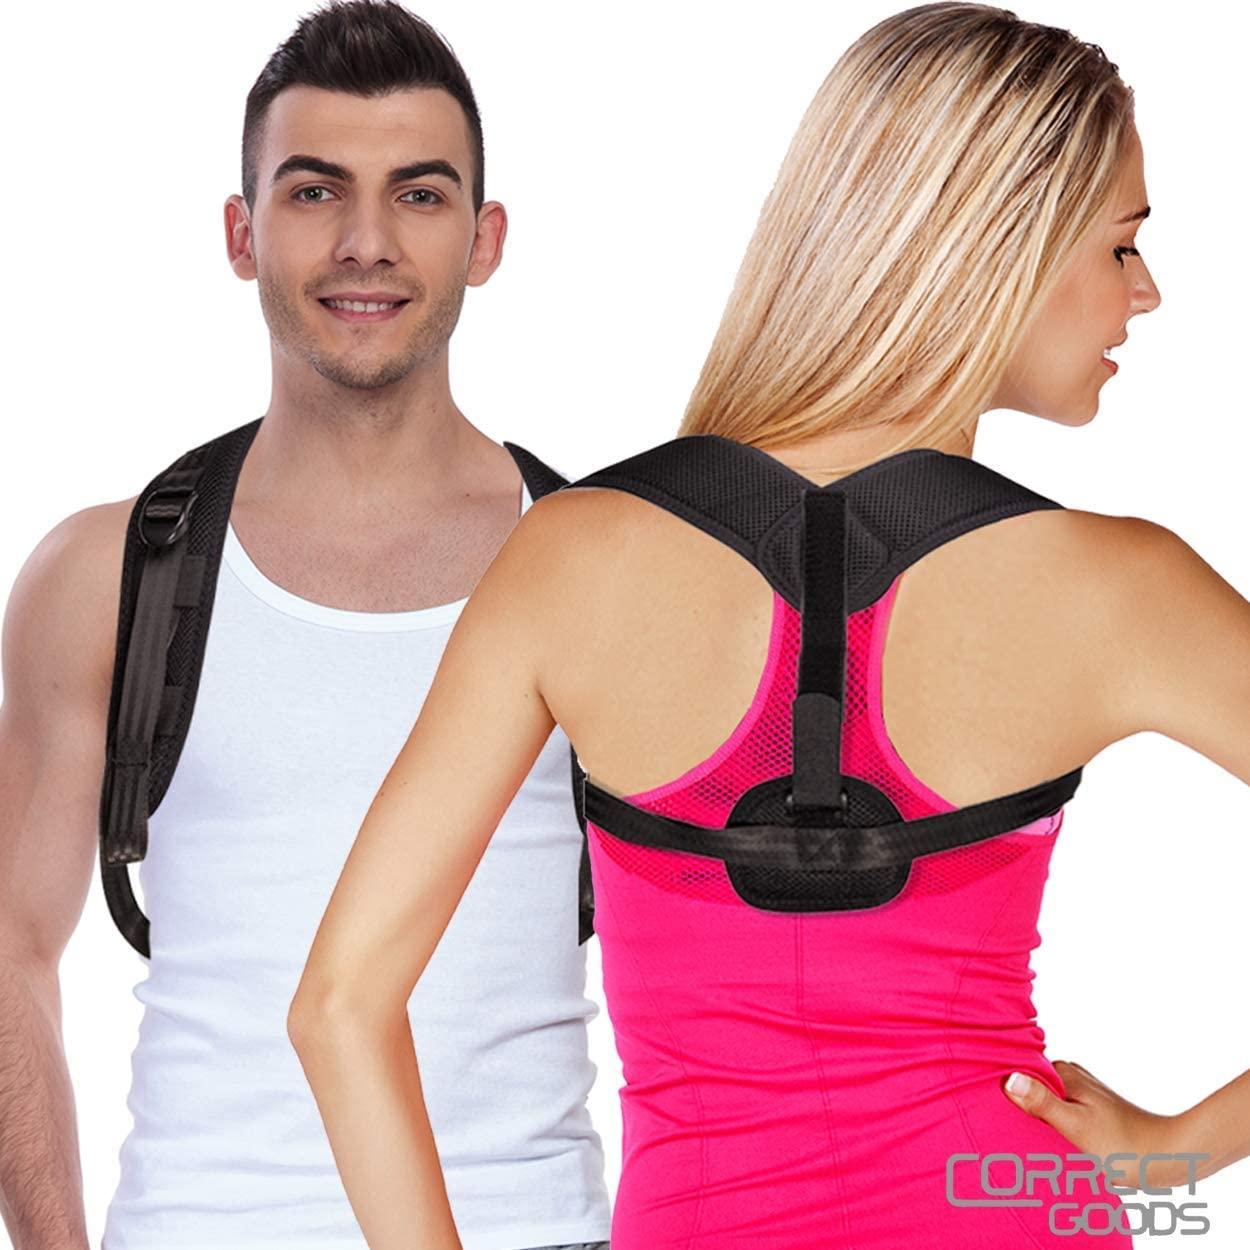 Posture Corrector-Back Brace for Men and Women–Back Posture Support Brace and Neck-Shoulder Back Pain Relief – Fully Adjustable Upper Back Clavicle Comfy Straightener Support Brace for Slouching & Hunching